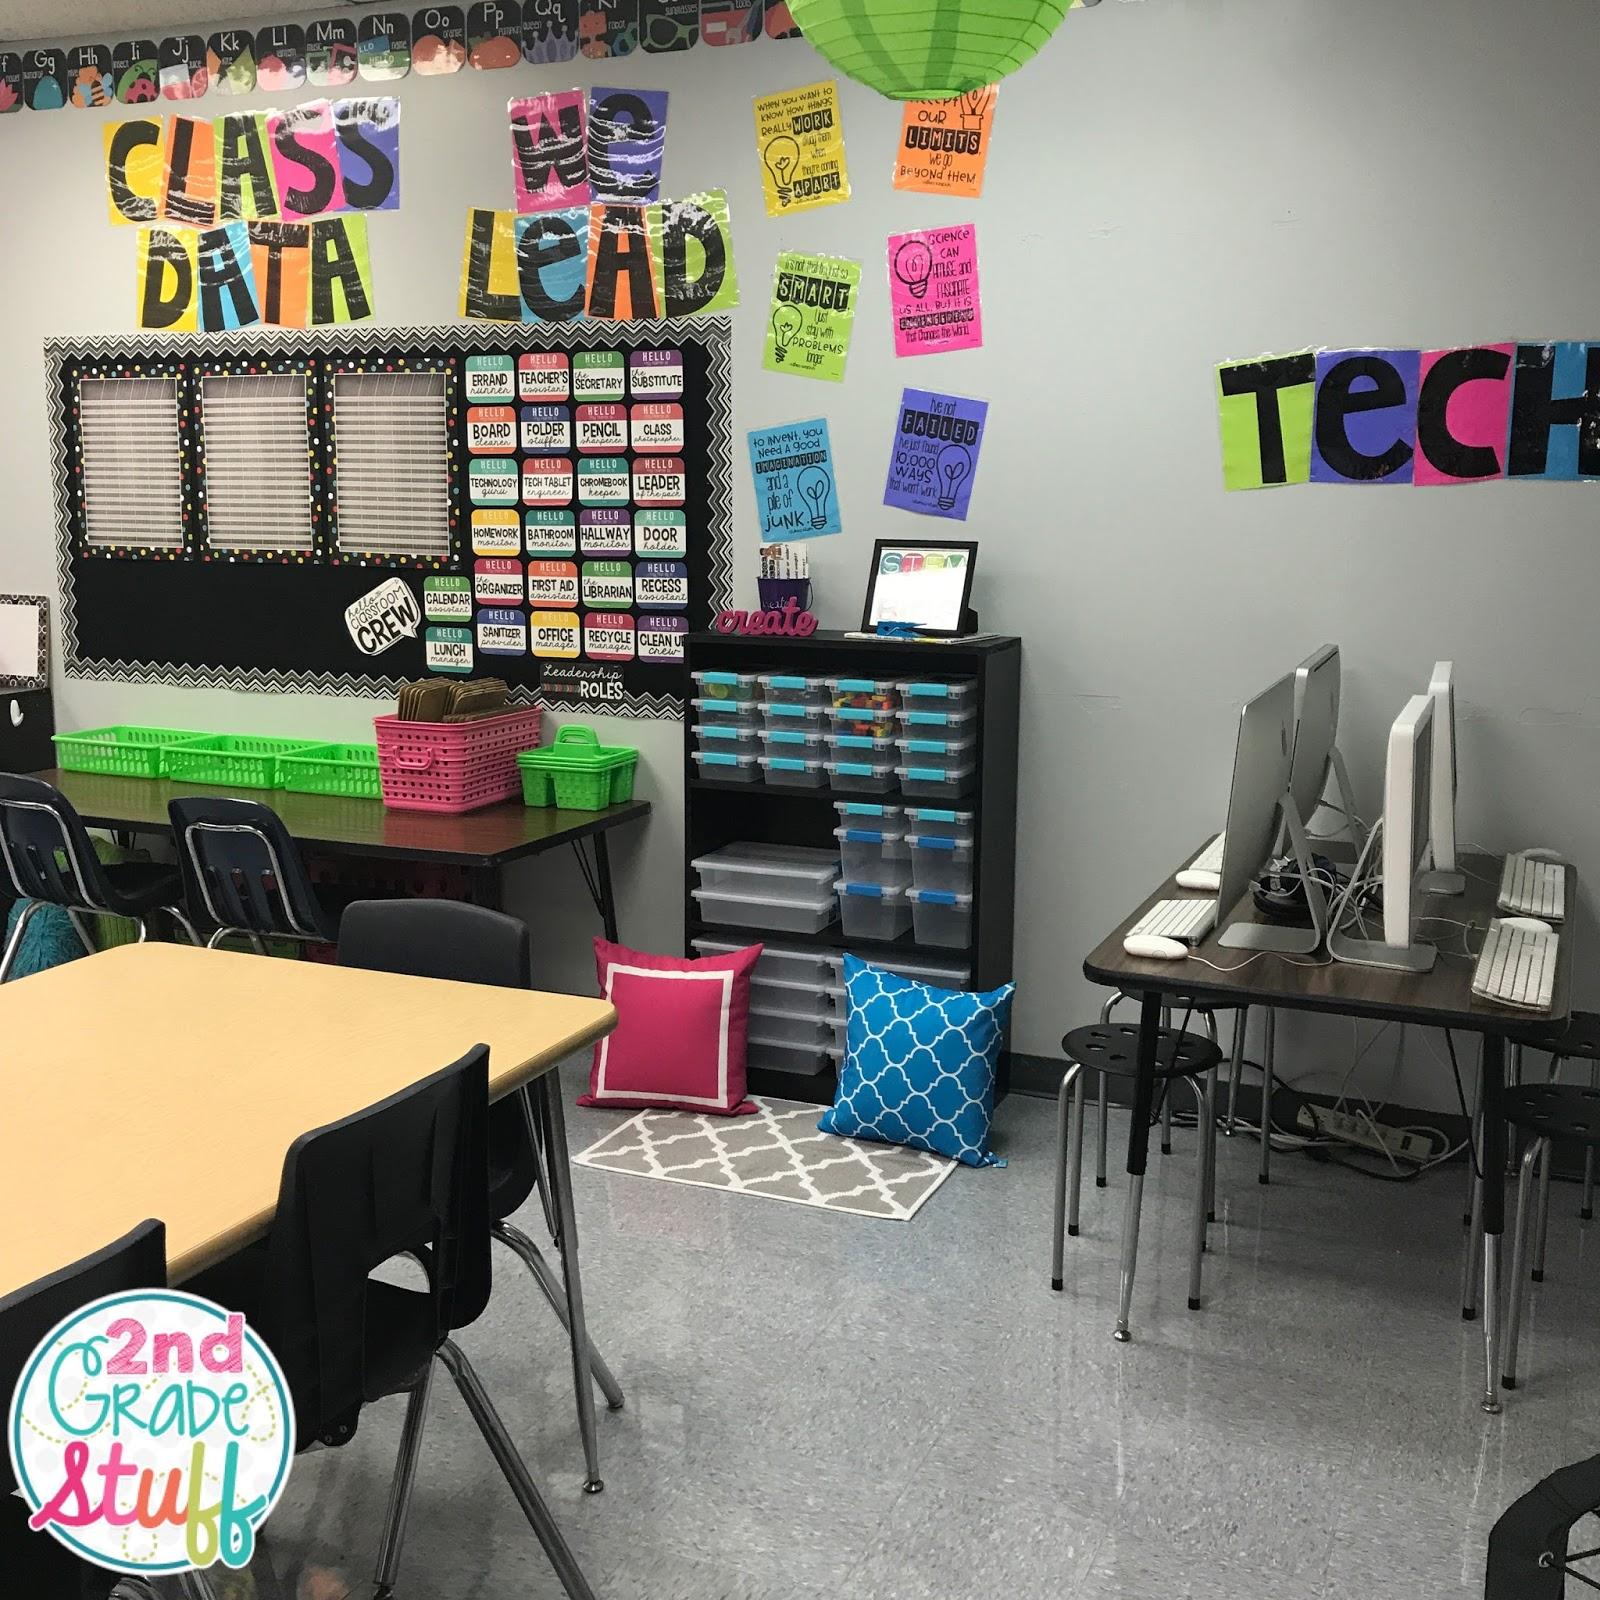 Stem School Design: 2nd Grade Stuff: Classroom Reveal 2017-2018